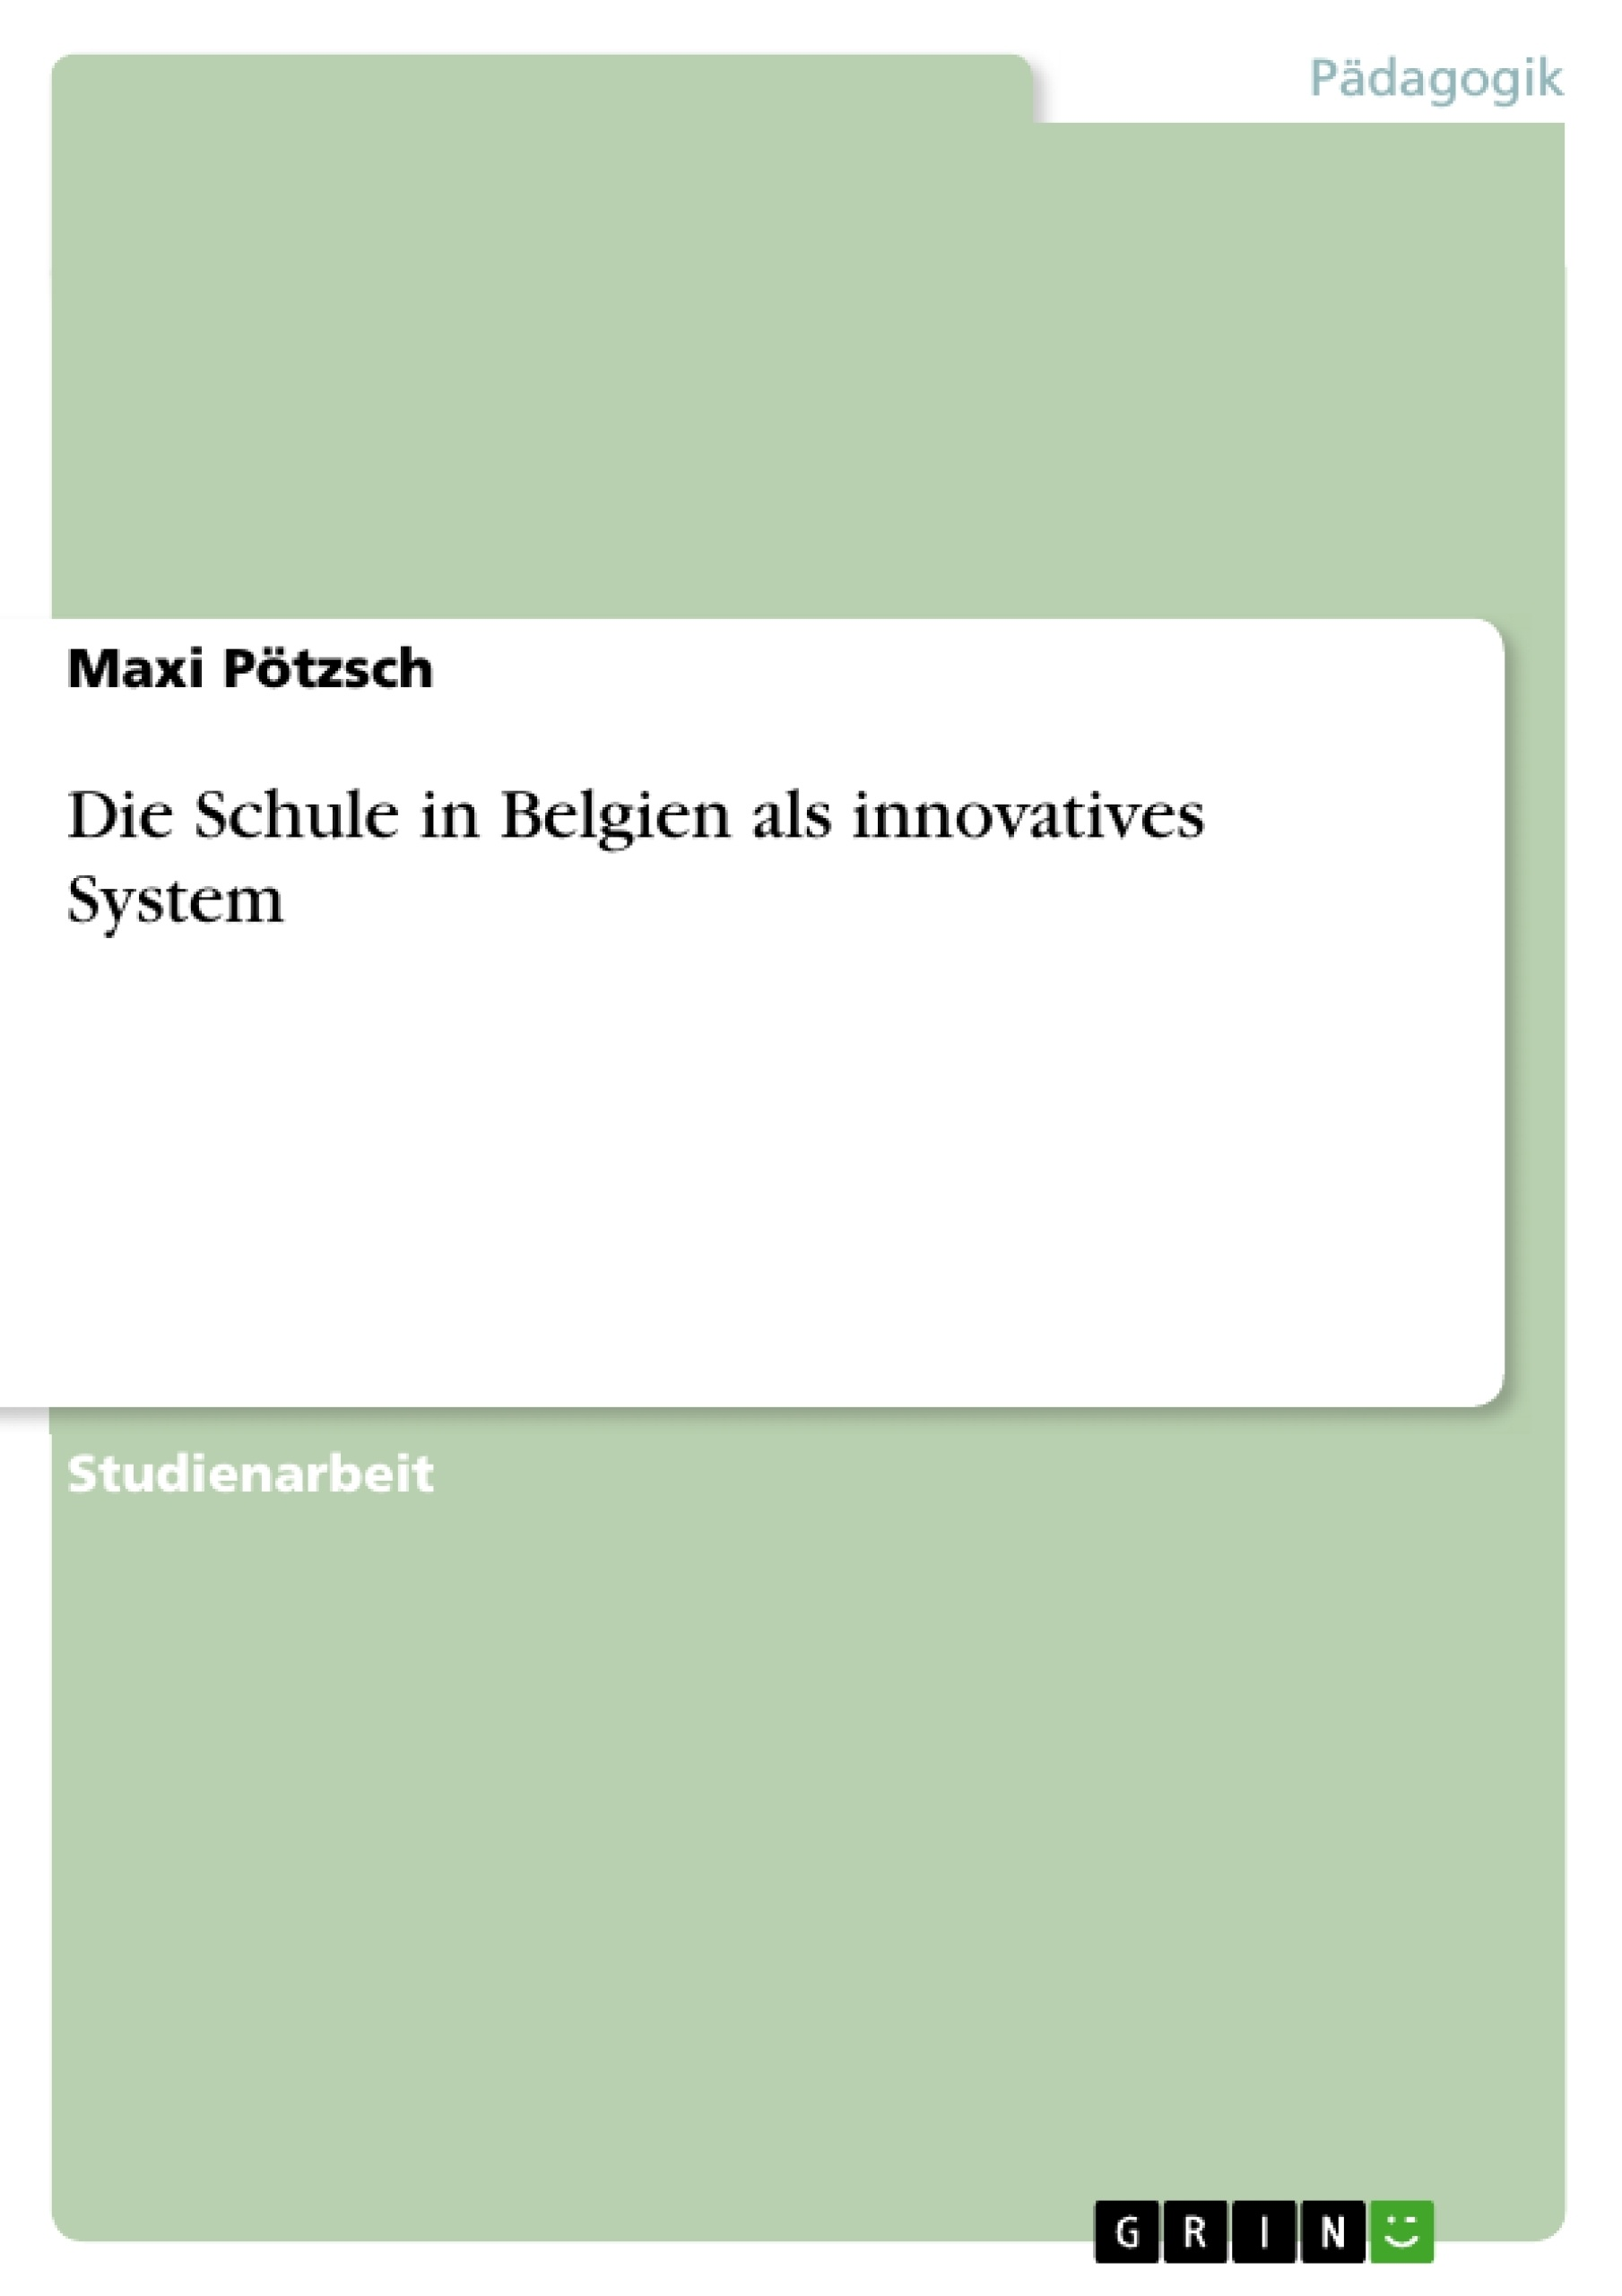 Titel: Die Schule in Belgien als innovatives System